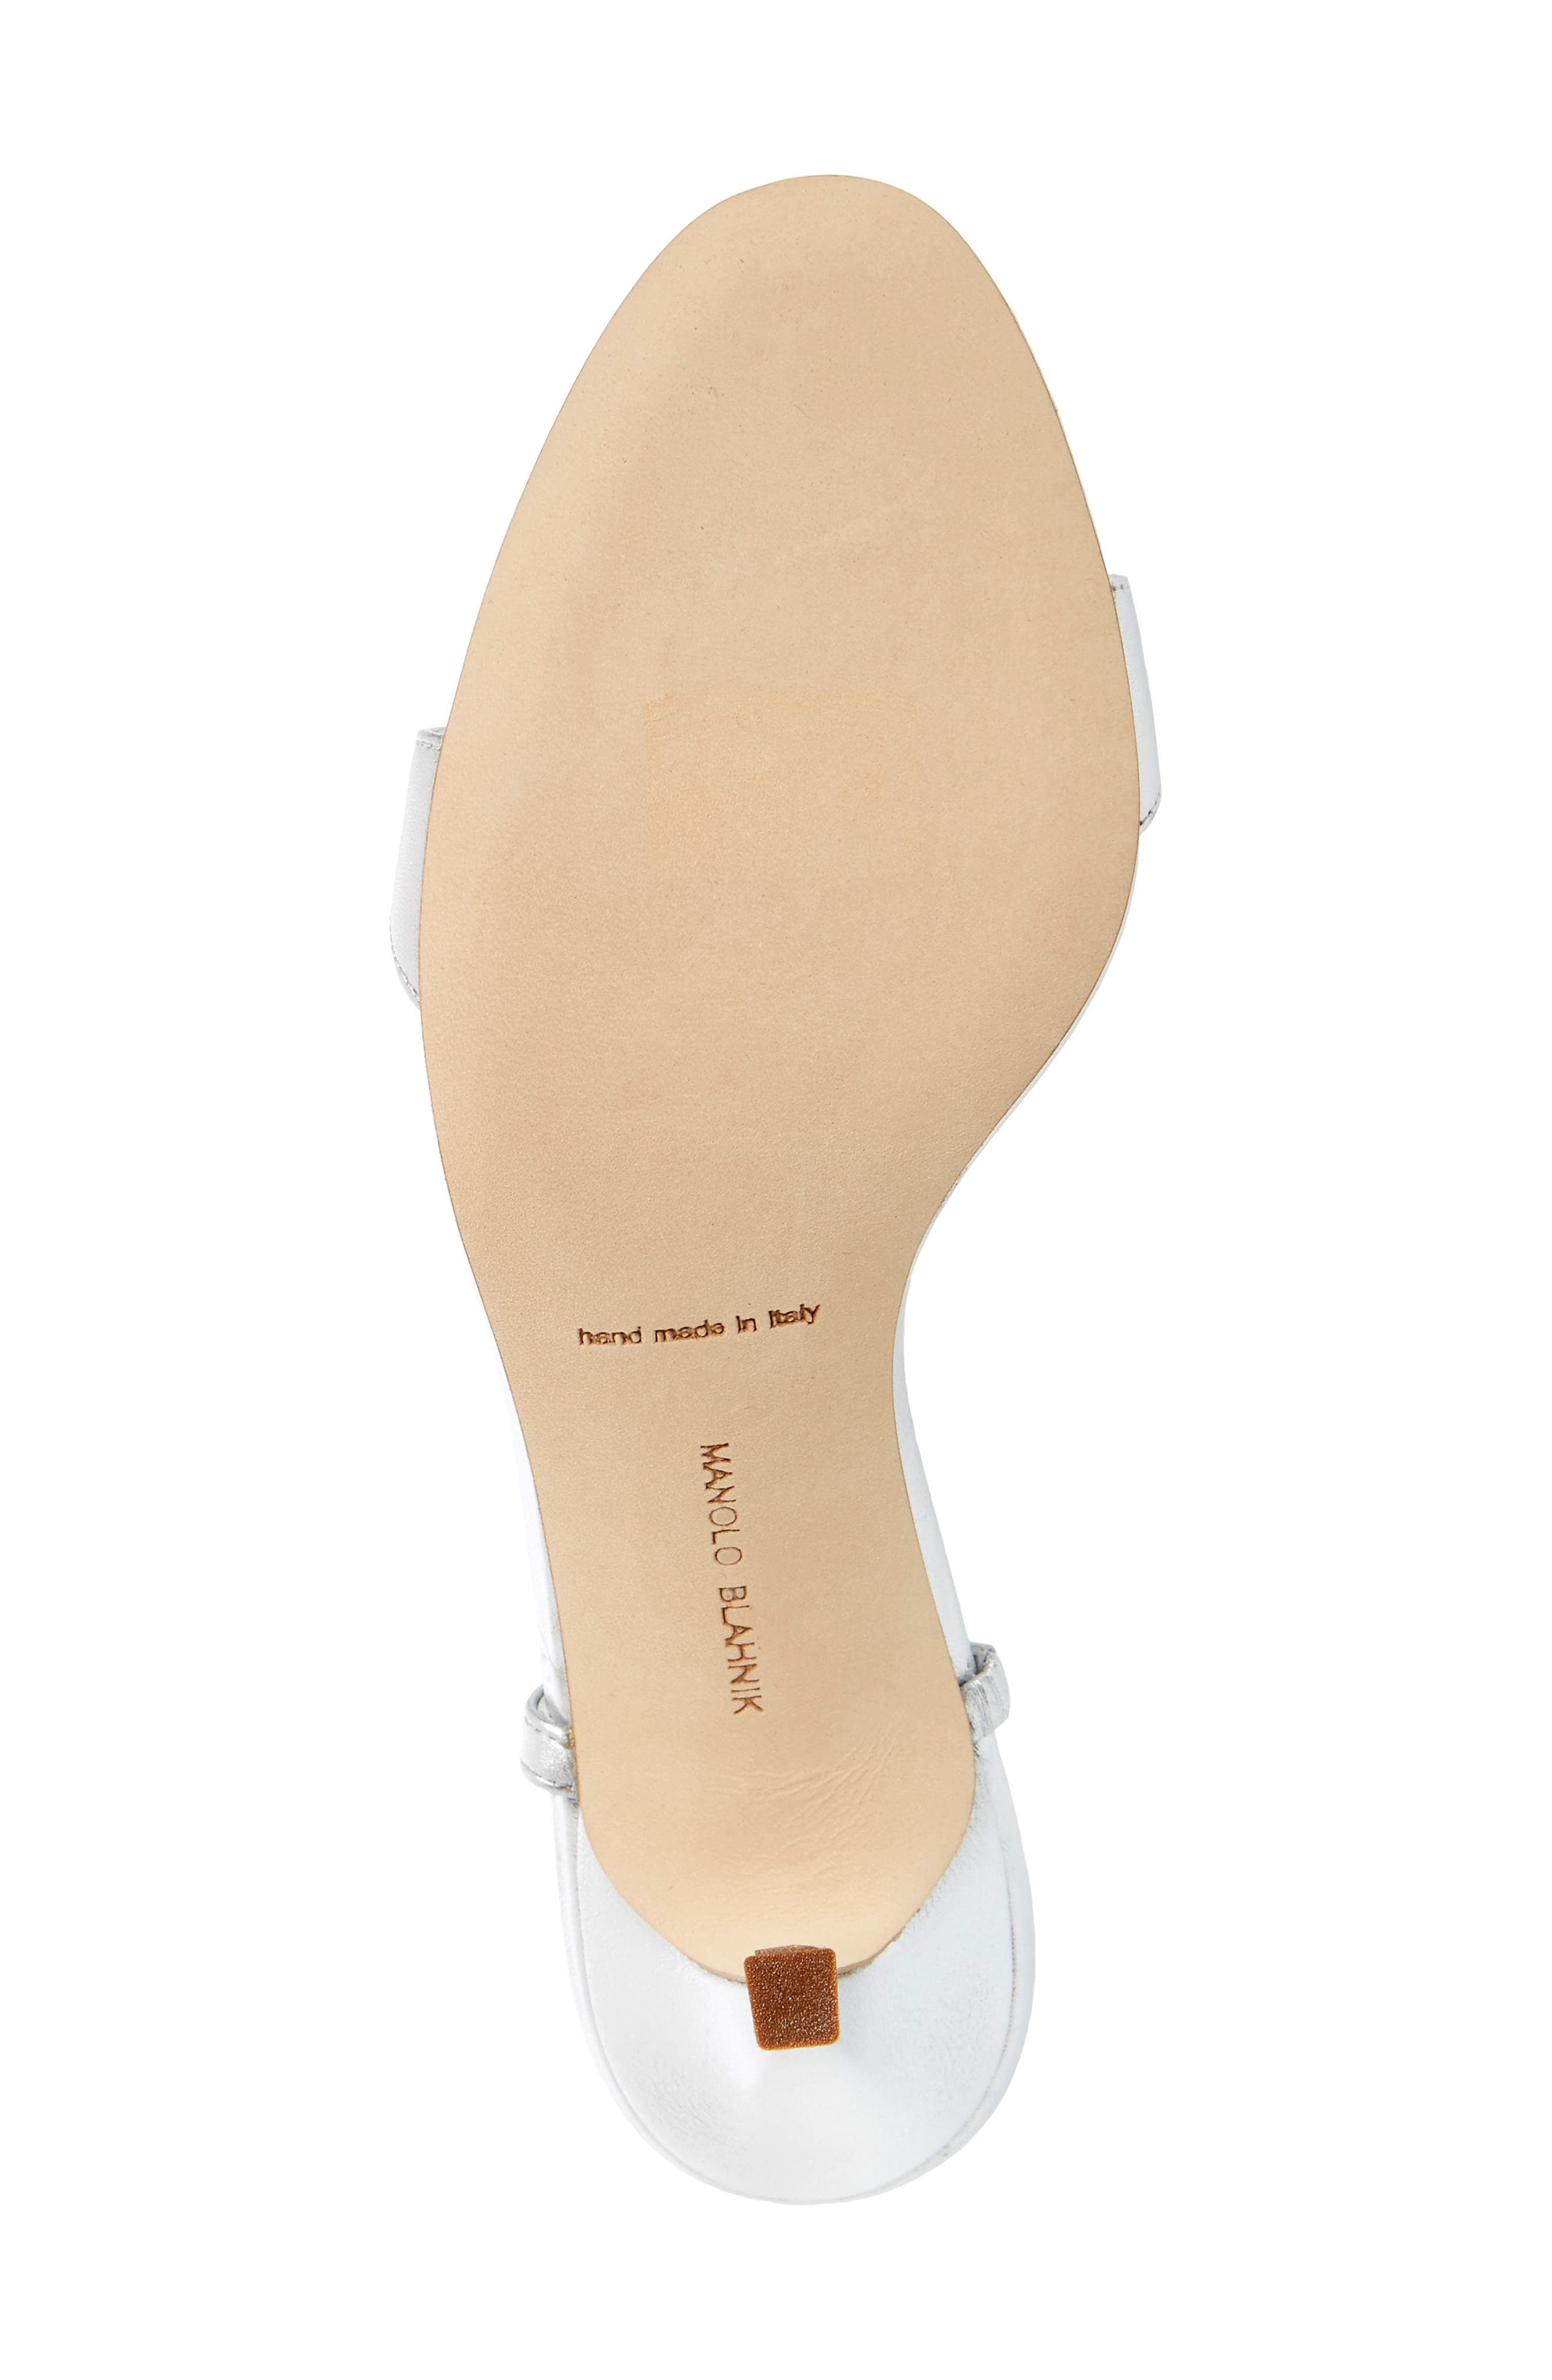 Dallifac Embellished Sandal,                             Alternate thumbnail 6, color,                             Silver